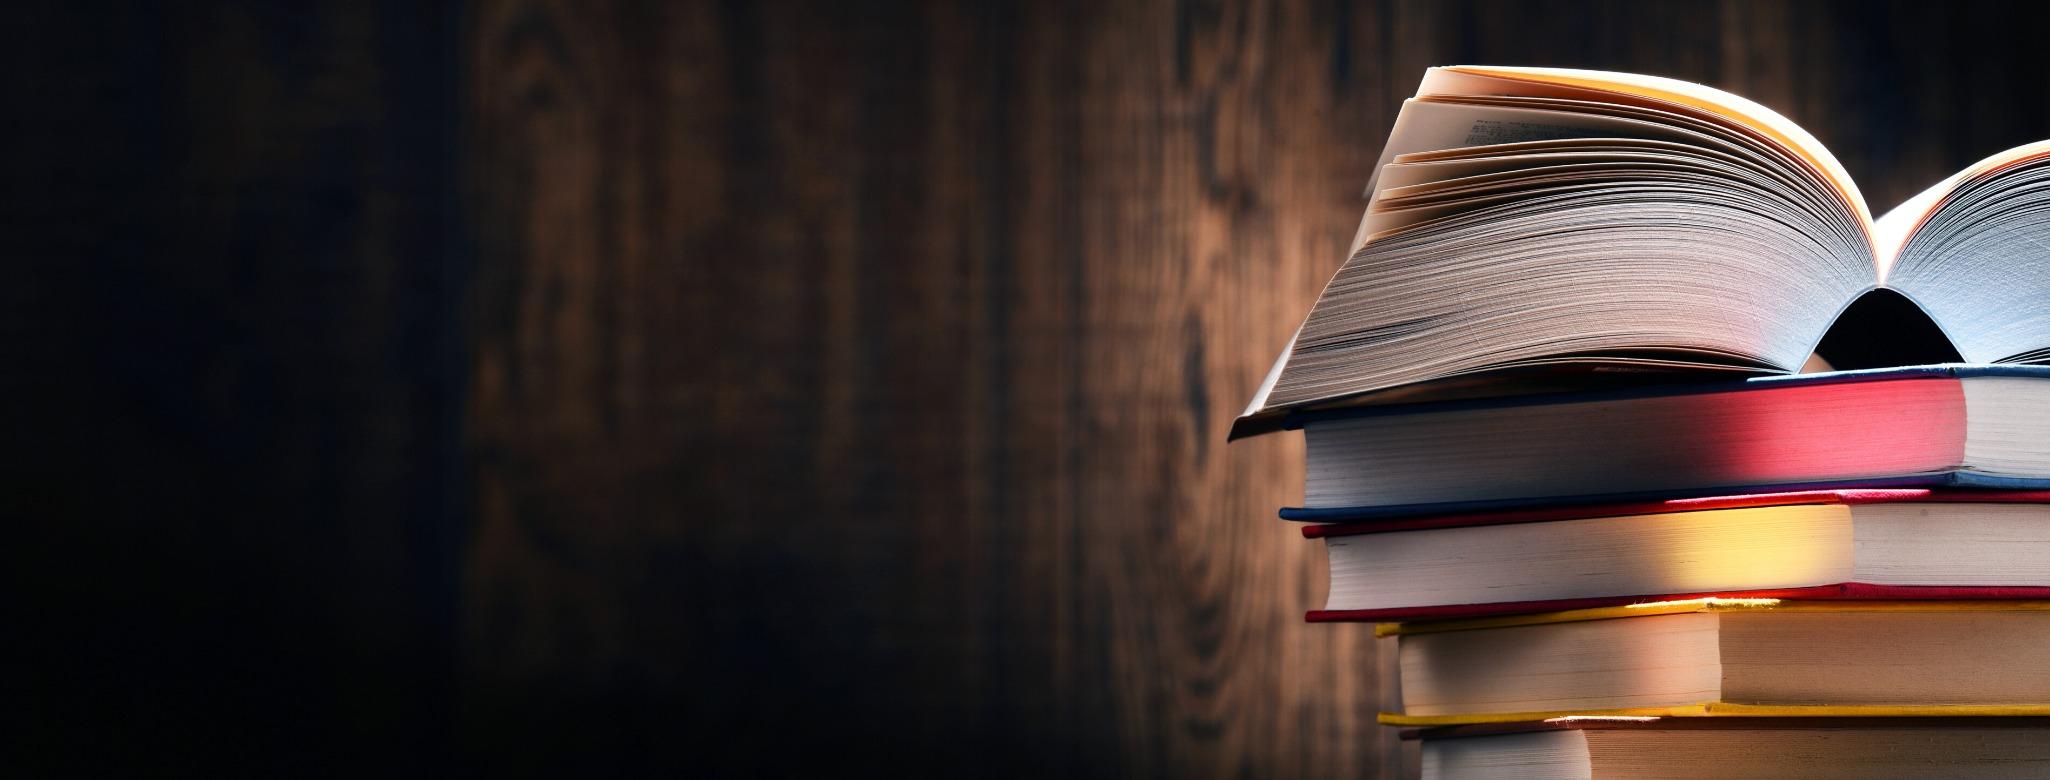 Vsetko o knihach